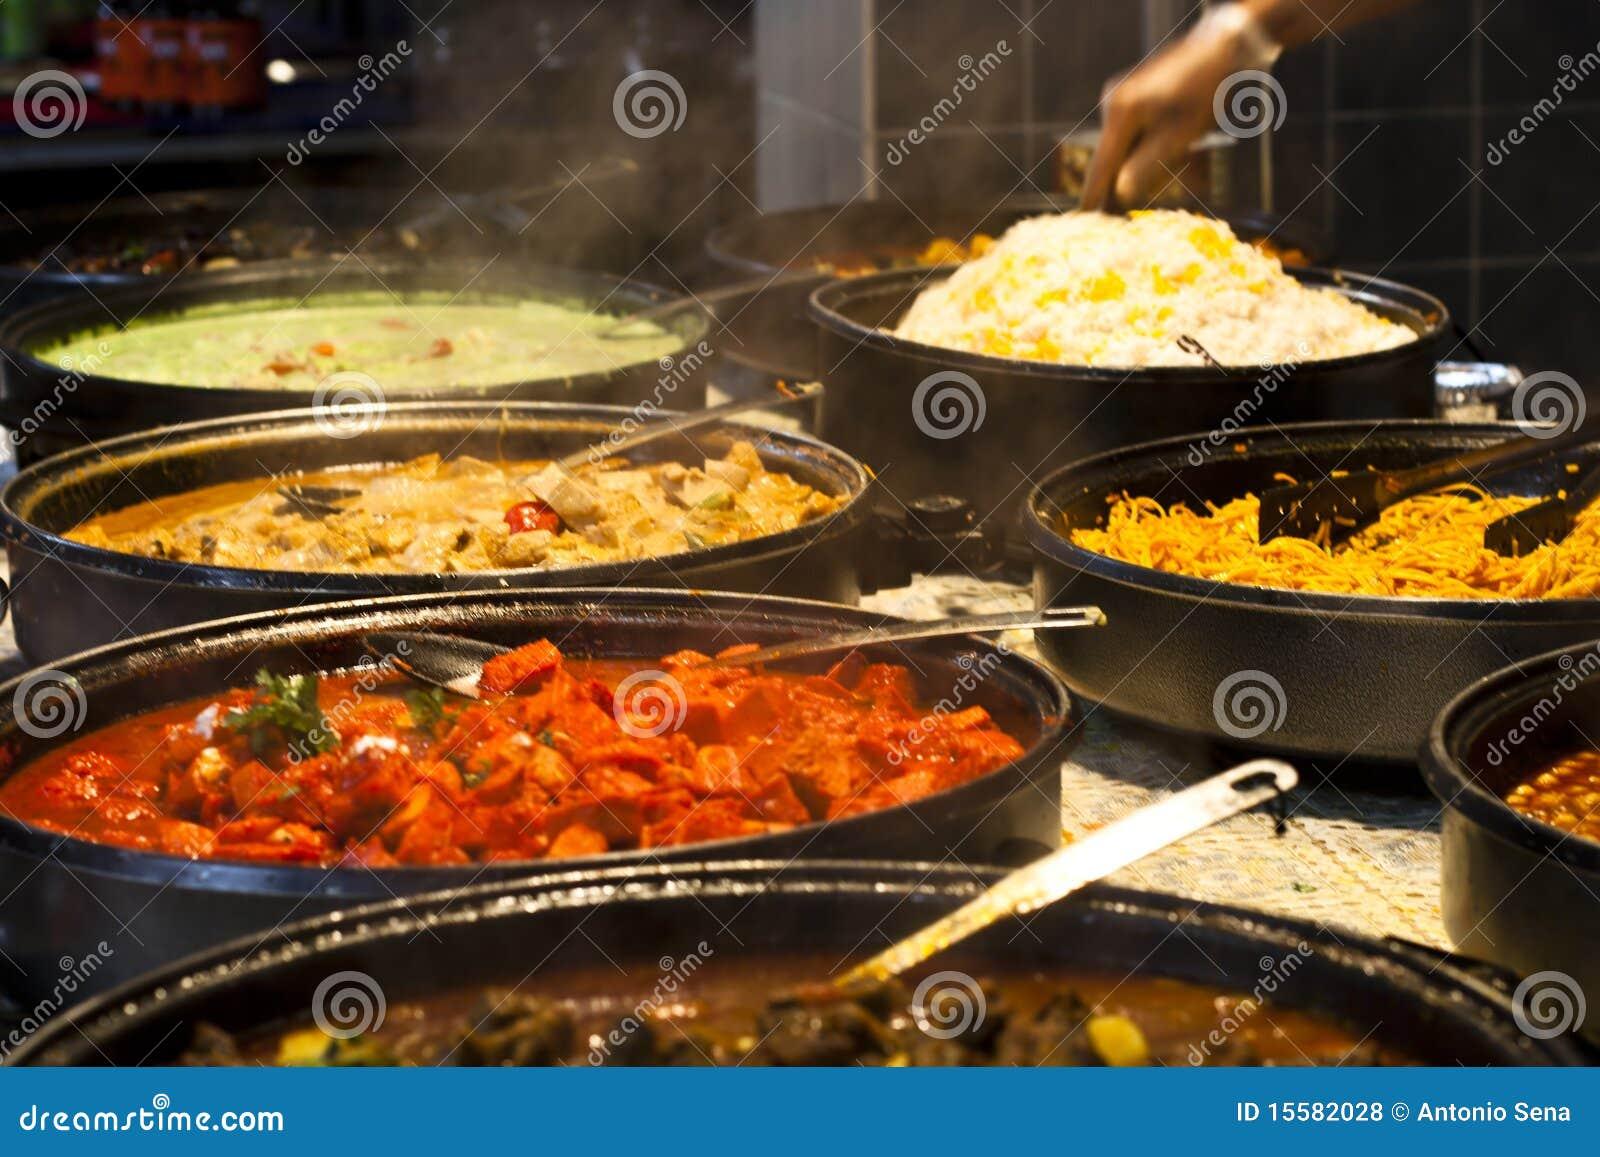 Incredible Indian Food Buffet 1300 x 957 · 179 kB · jpeg